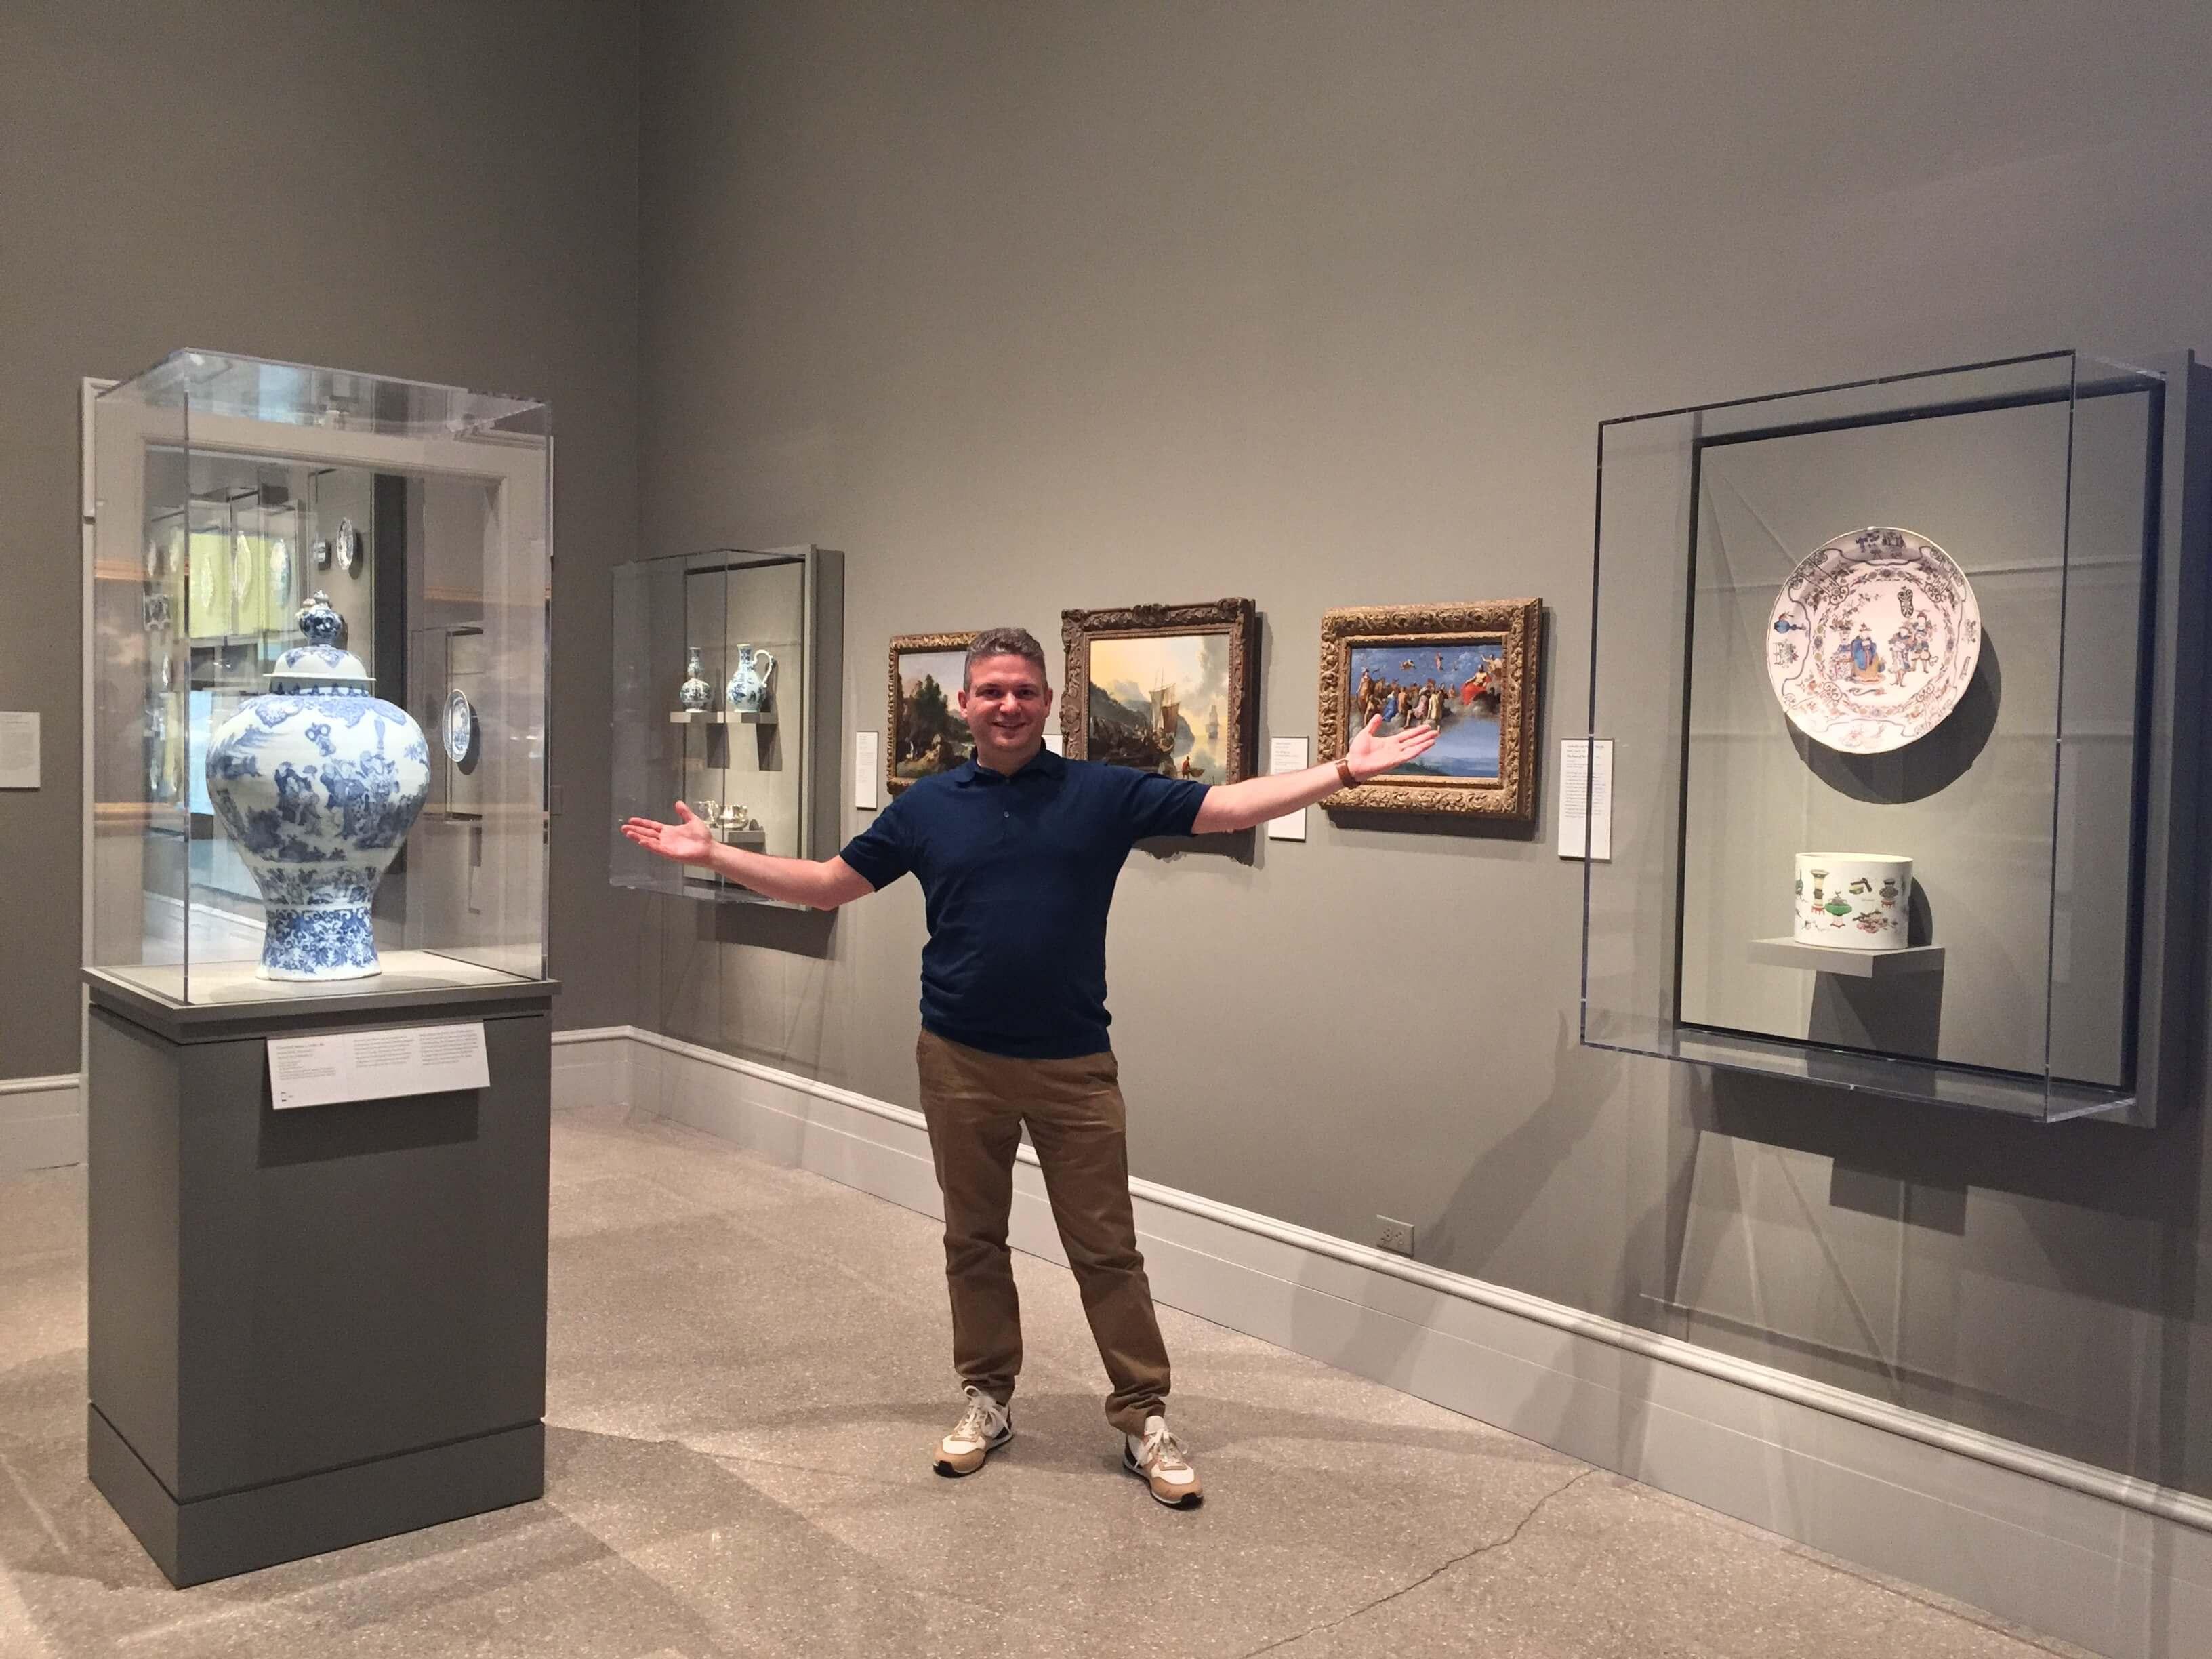 Robert Aronson in Wadsworth Atheneum Museum, Hartford, CT